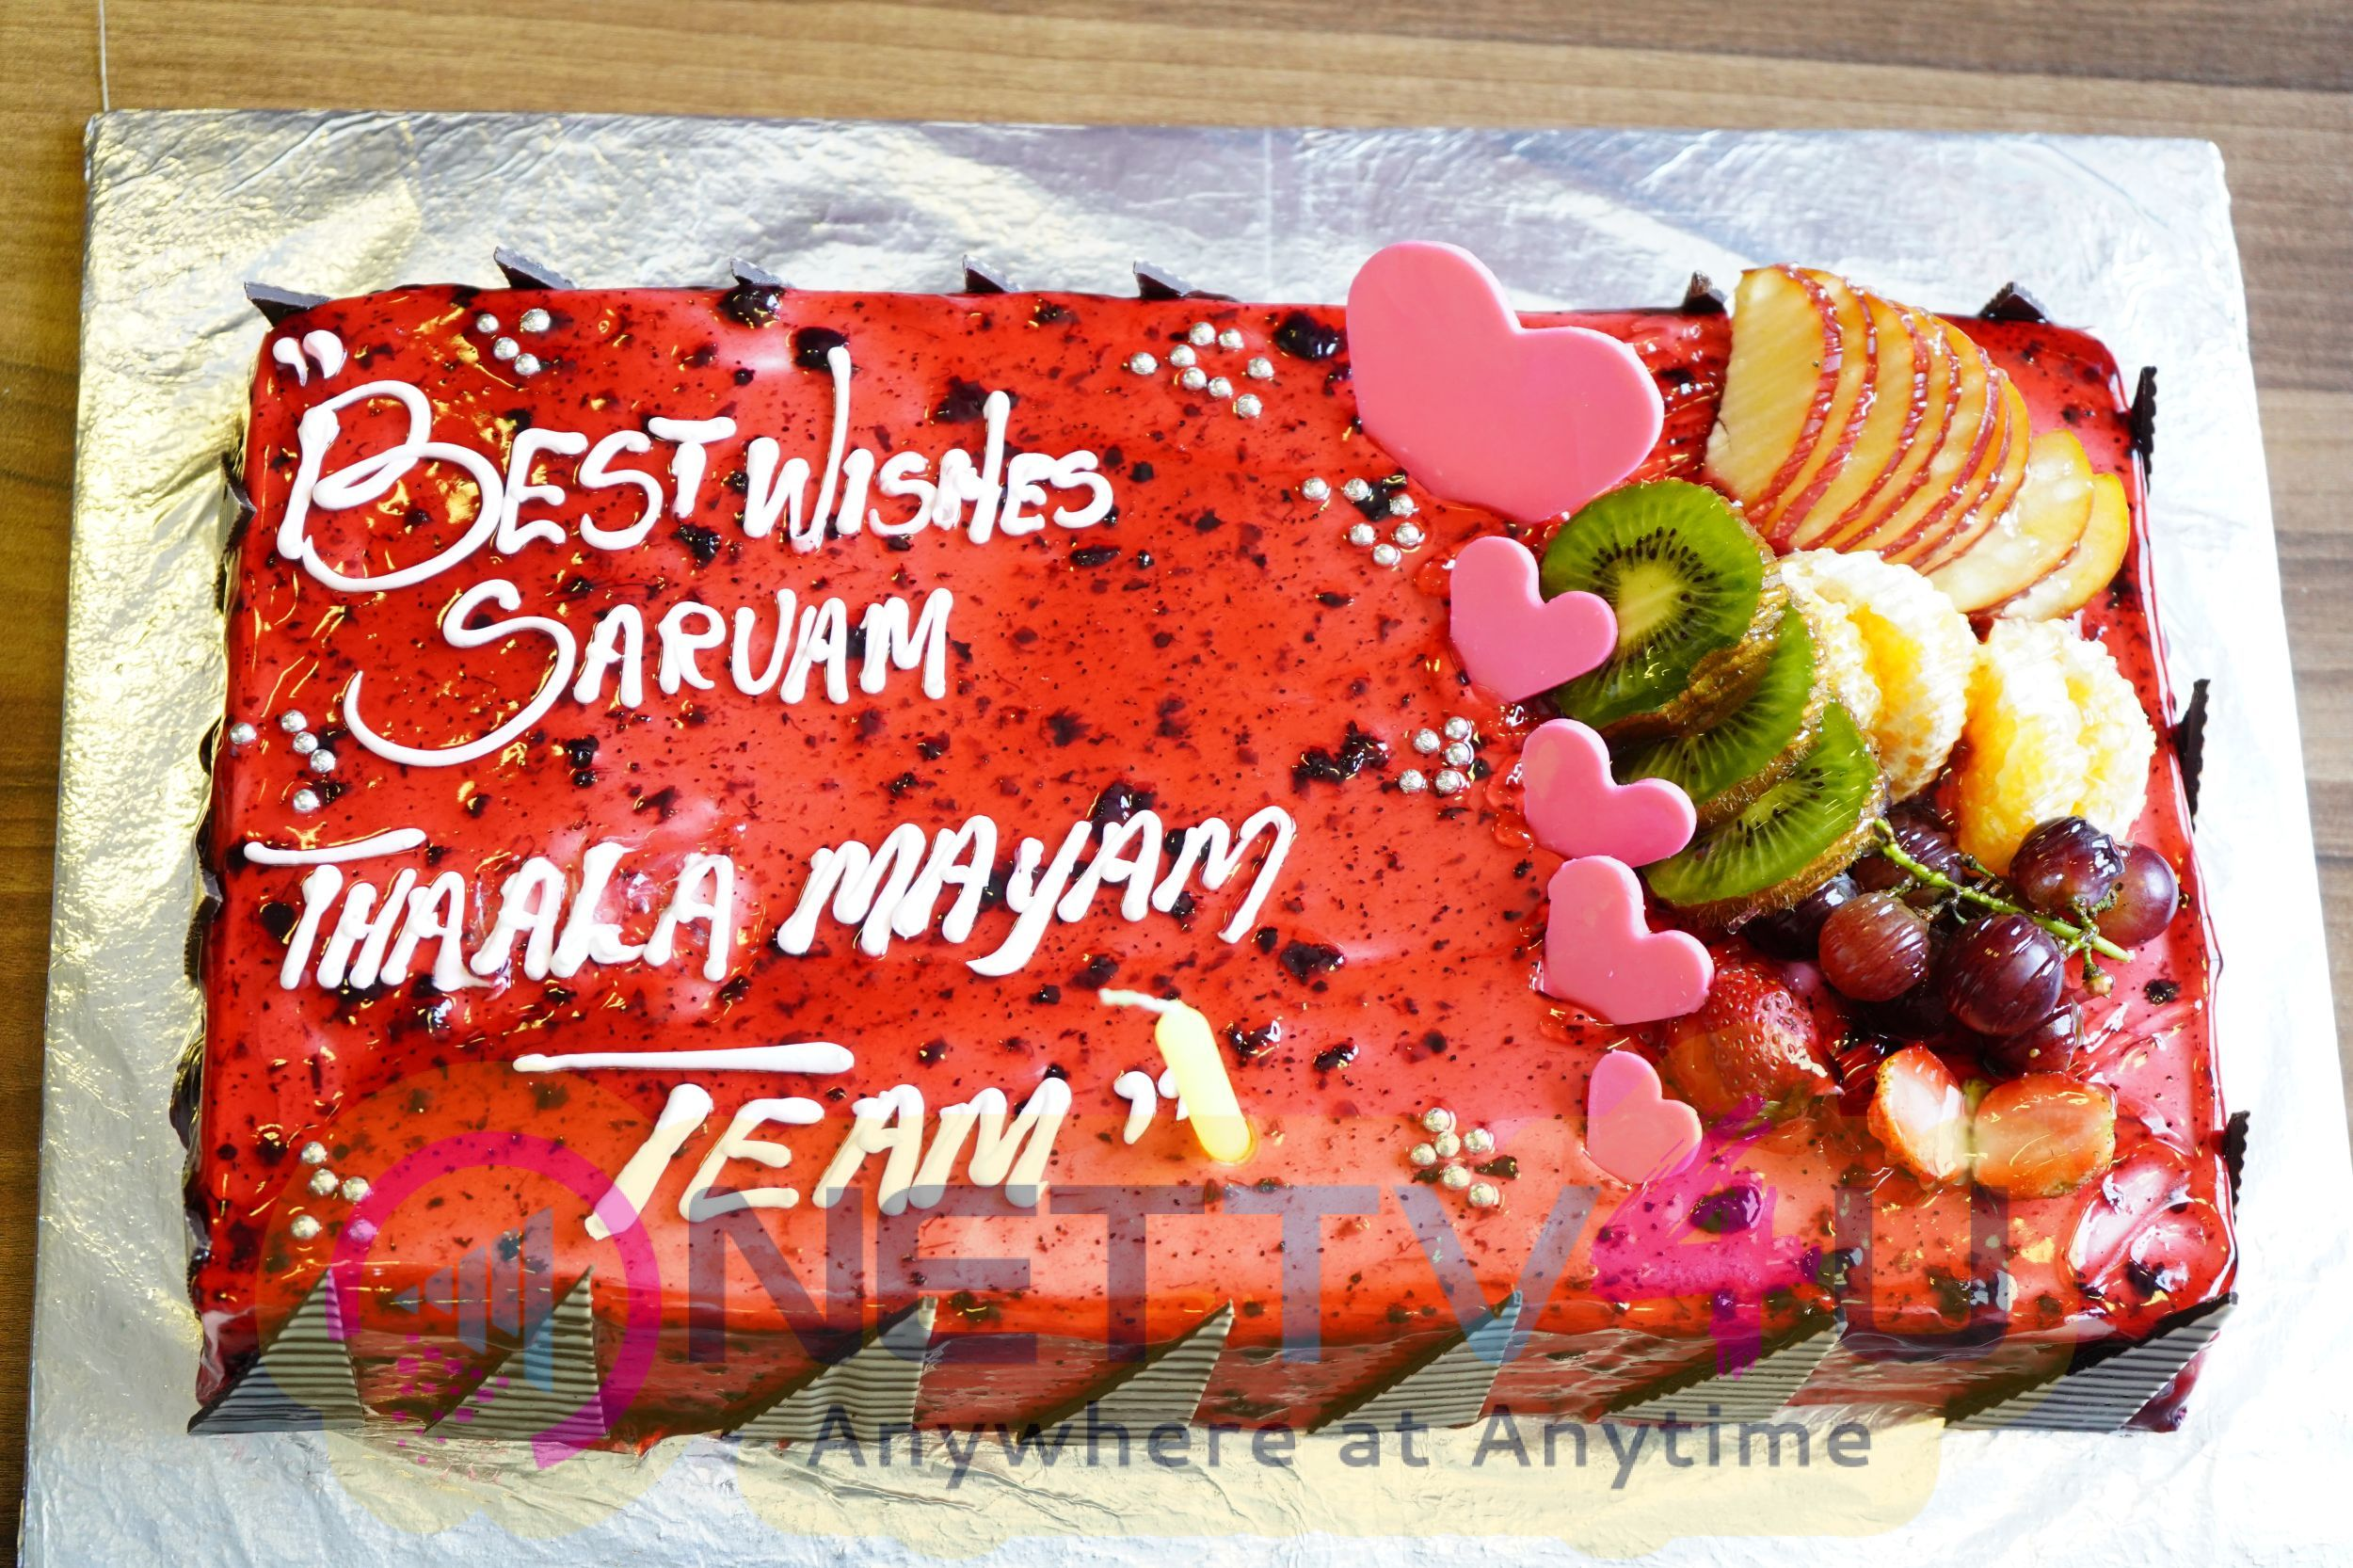 Sarvam Thaala Mayam Single Track Launch At Suryan FM Pics